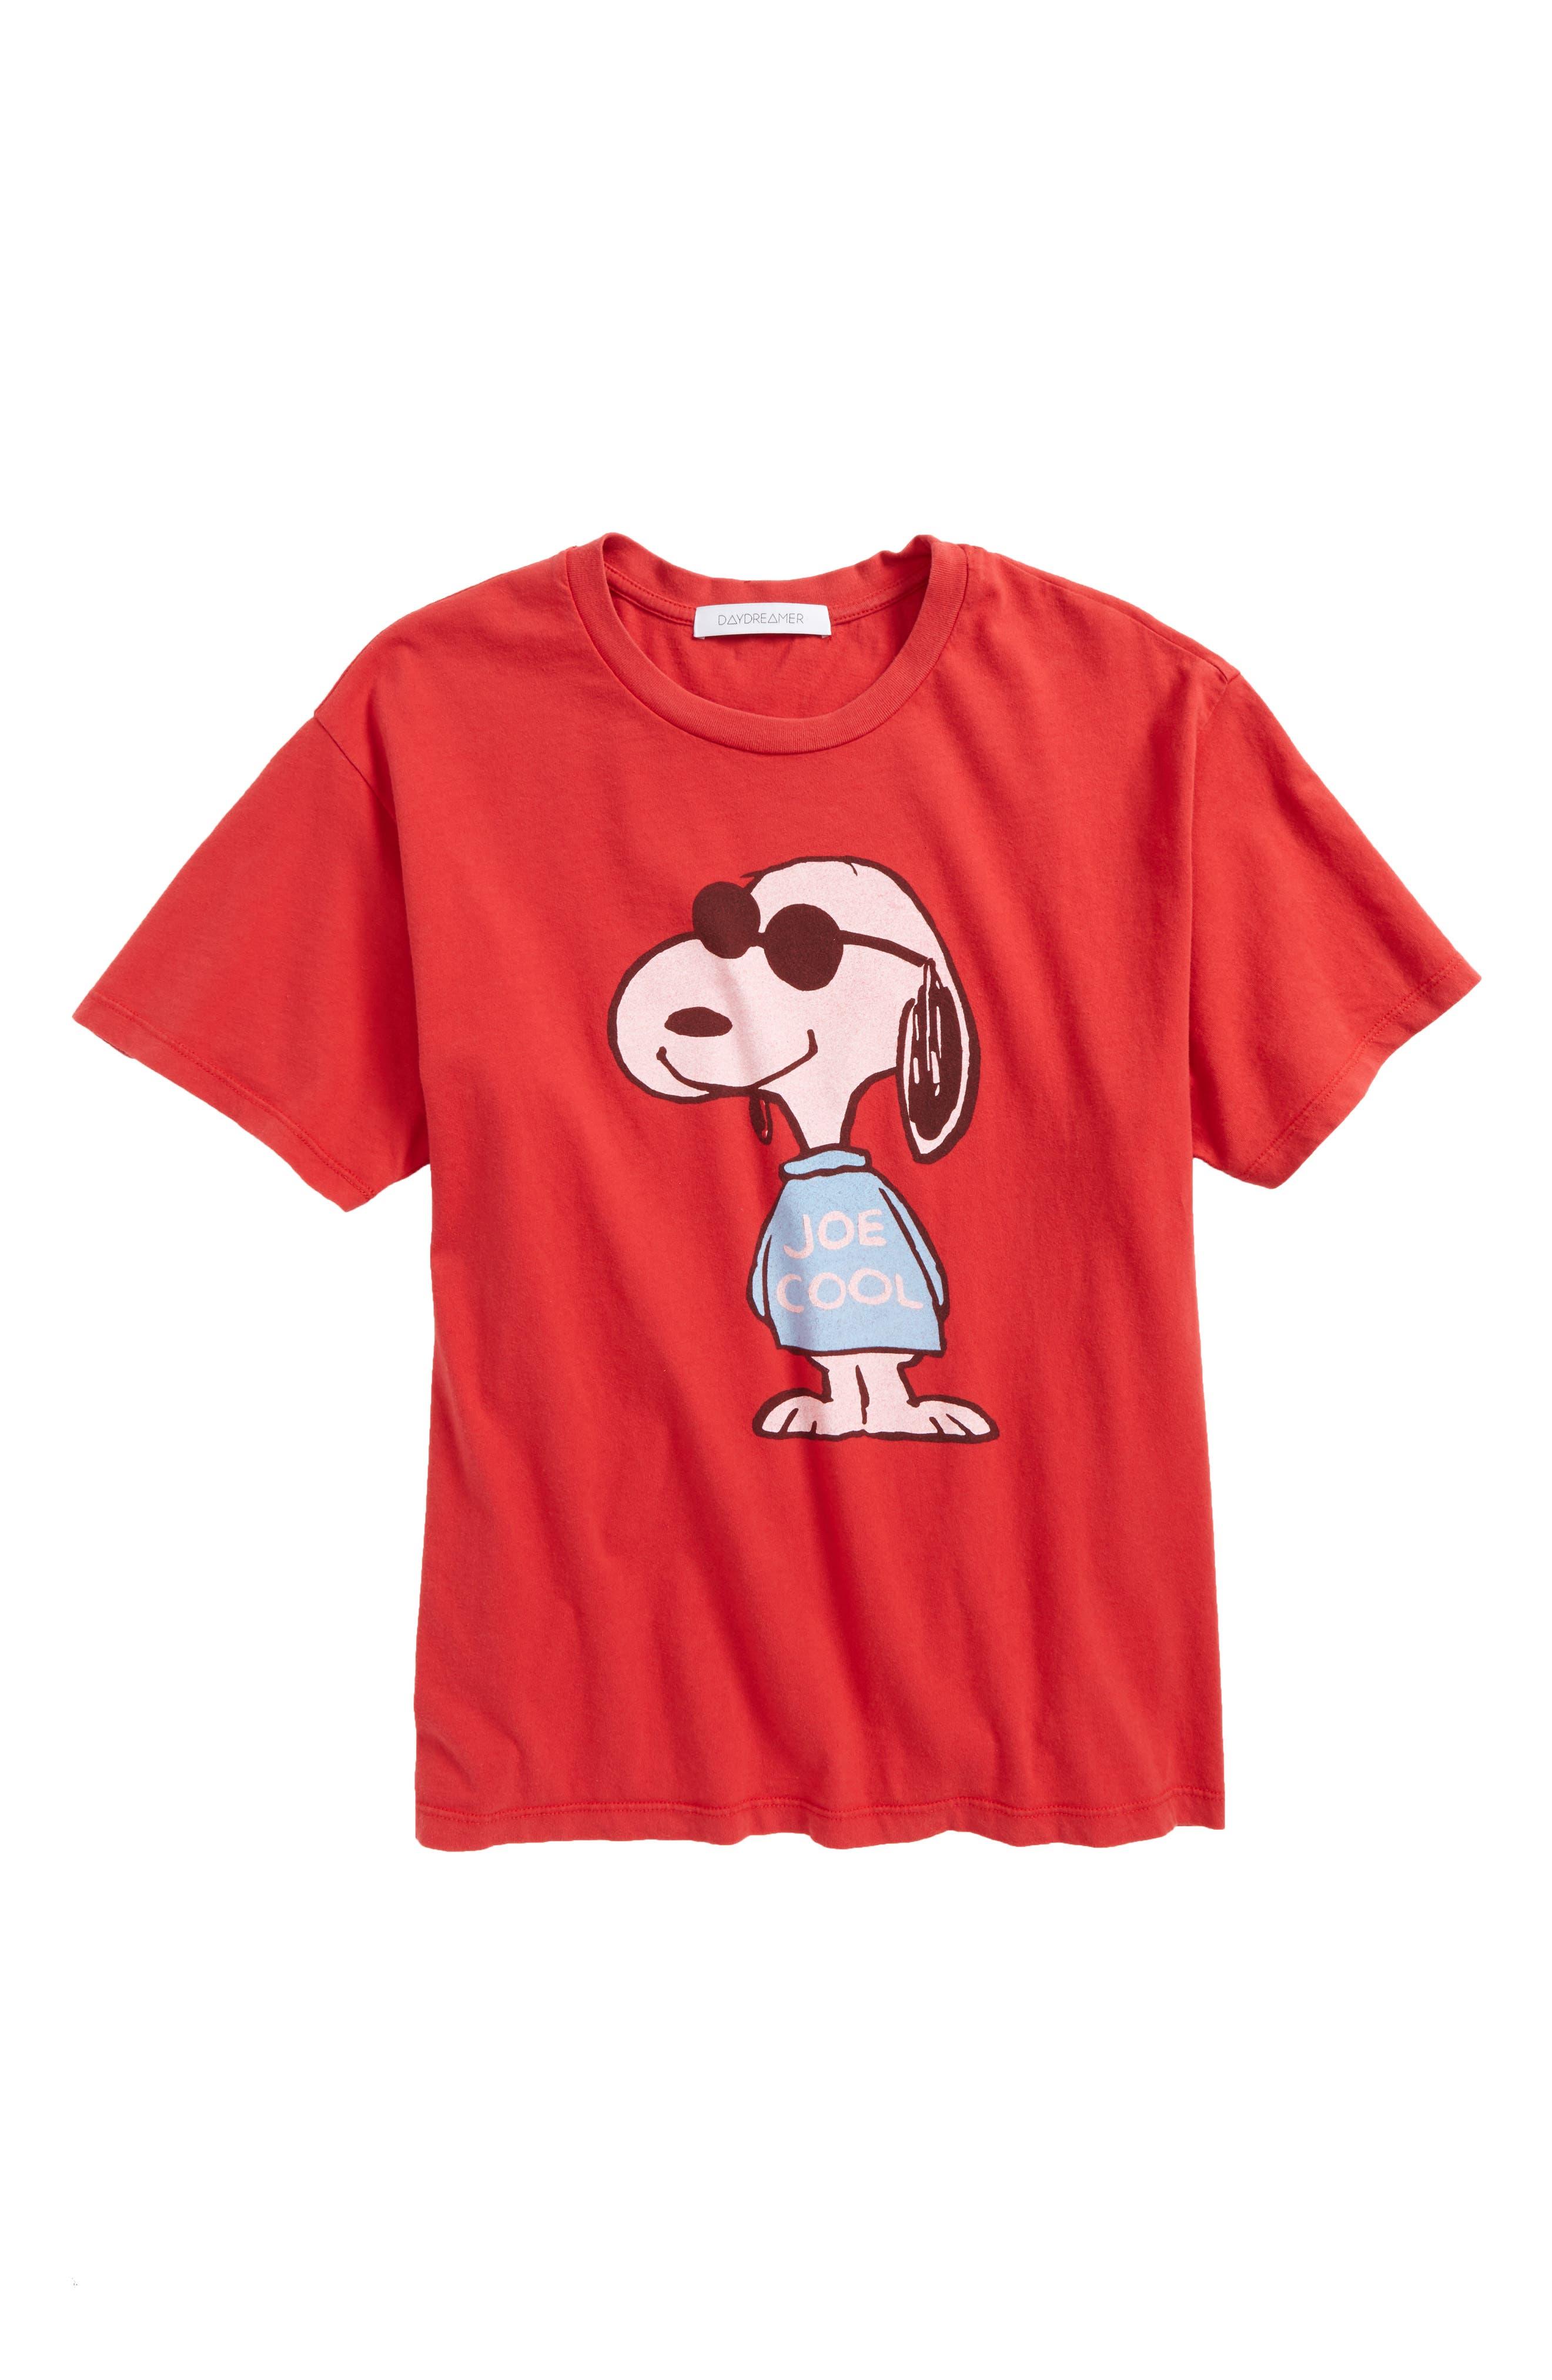 DAYDREAMER Joe Cool Tee in Red